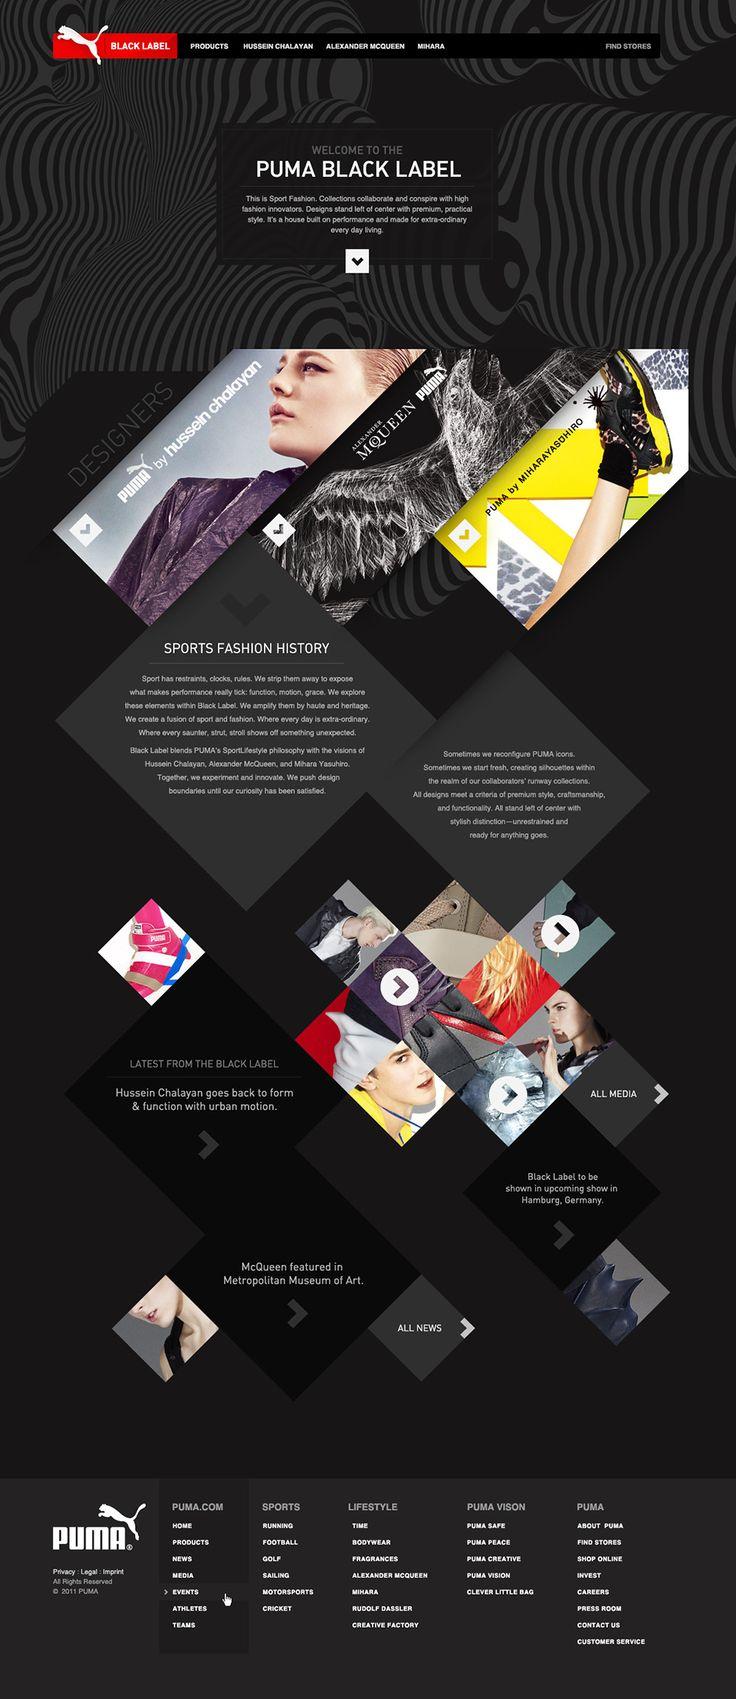 PUMA Black Label - Owen Shifflett : Design, Illustration, & Art Direction